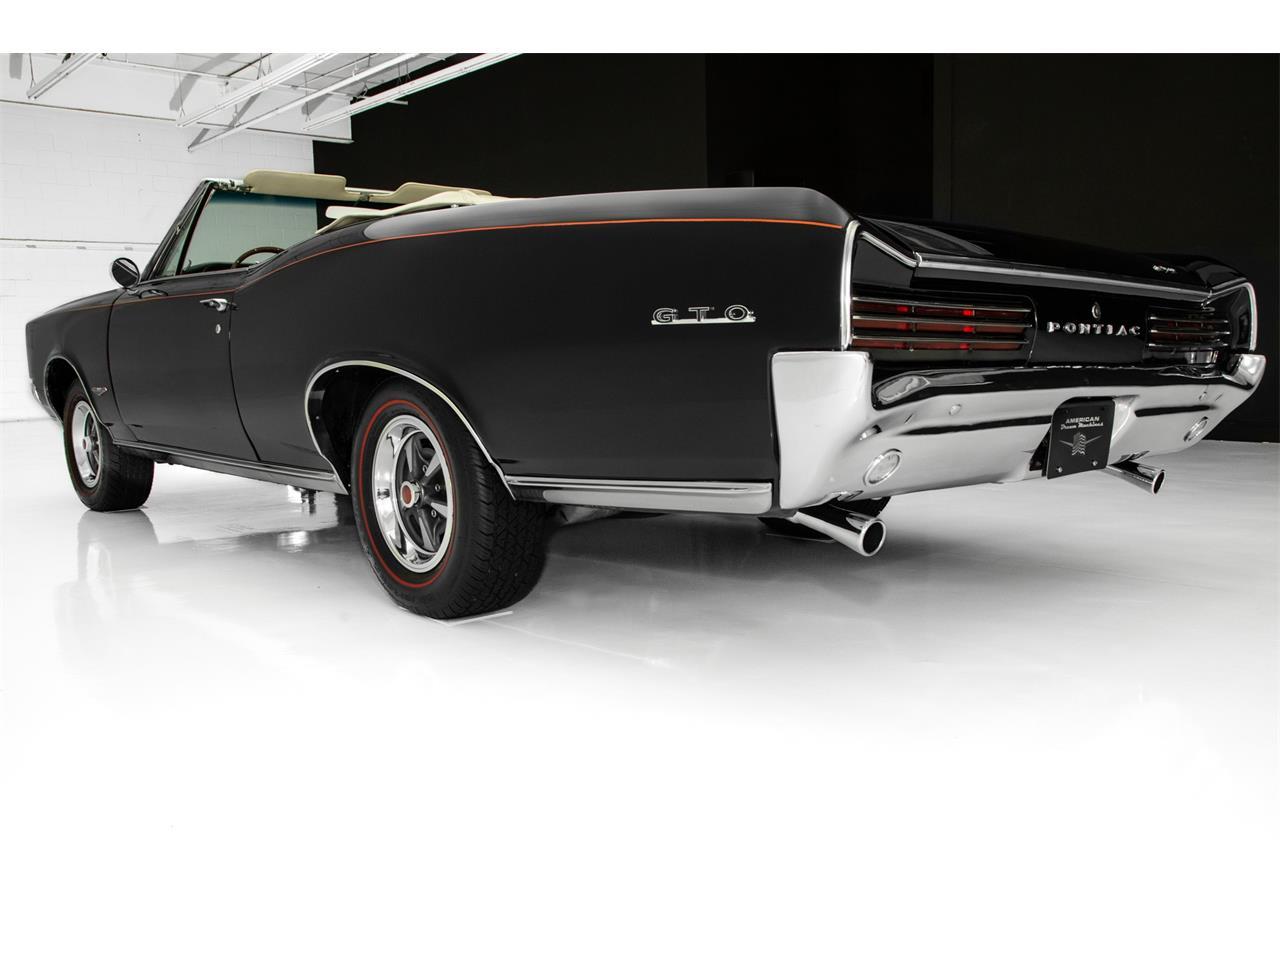 Large Picture of Classic '66 Pontiac GTO - $62,900.00 - QKZ0